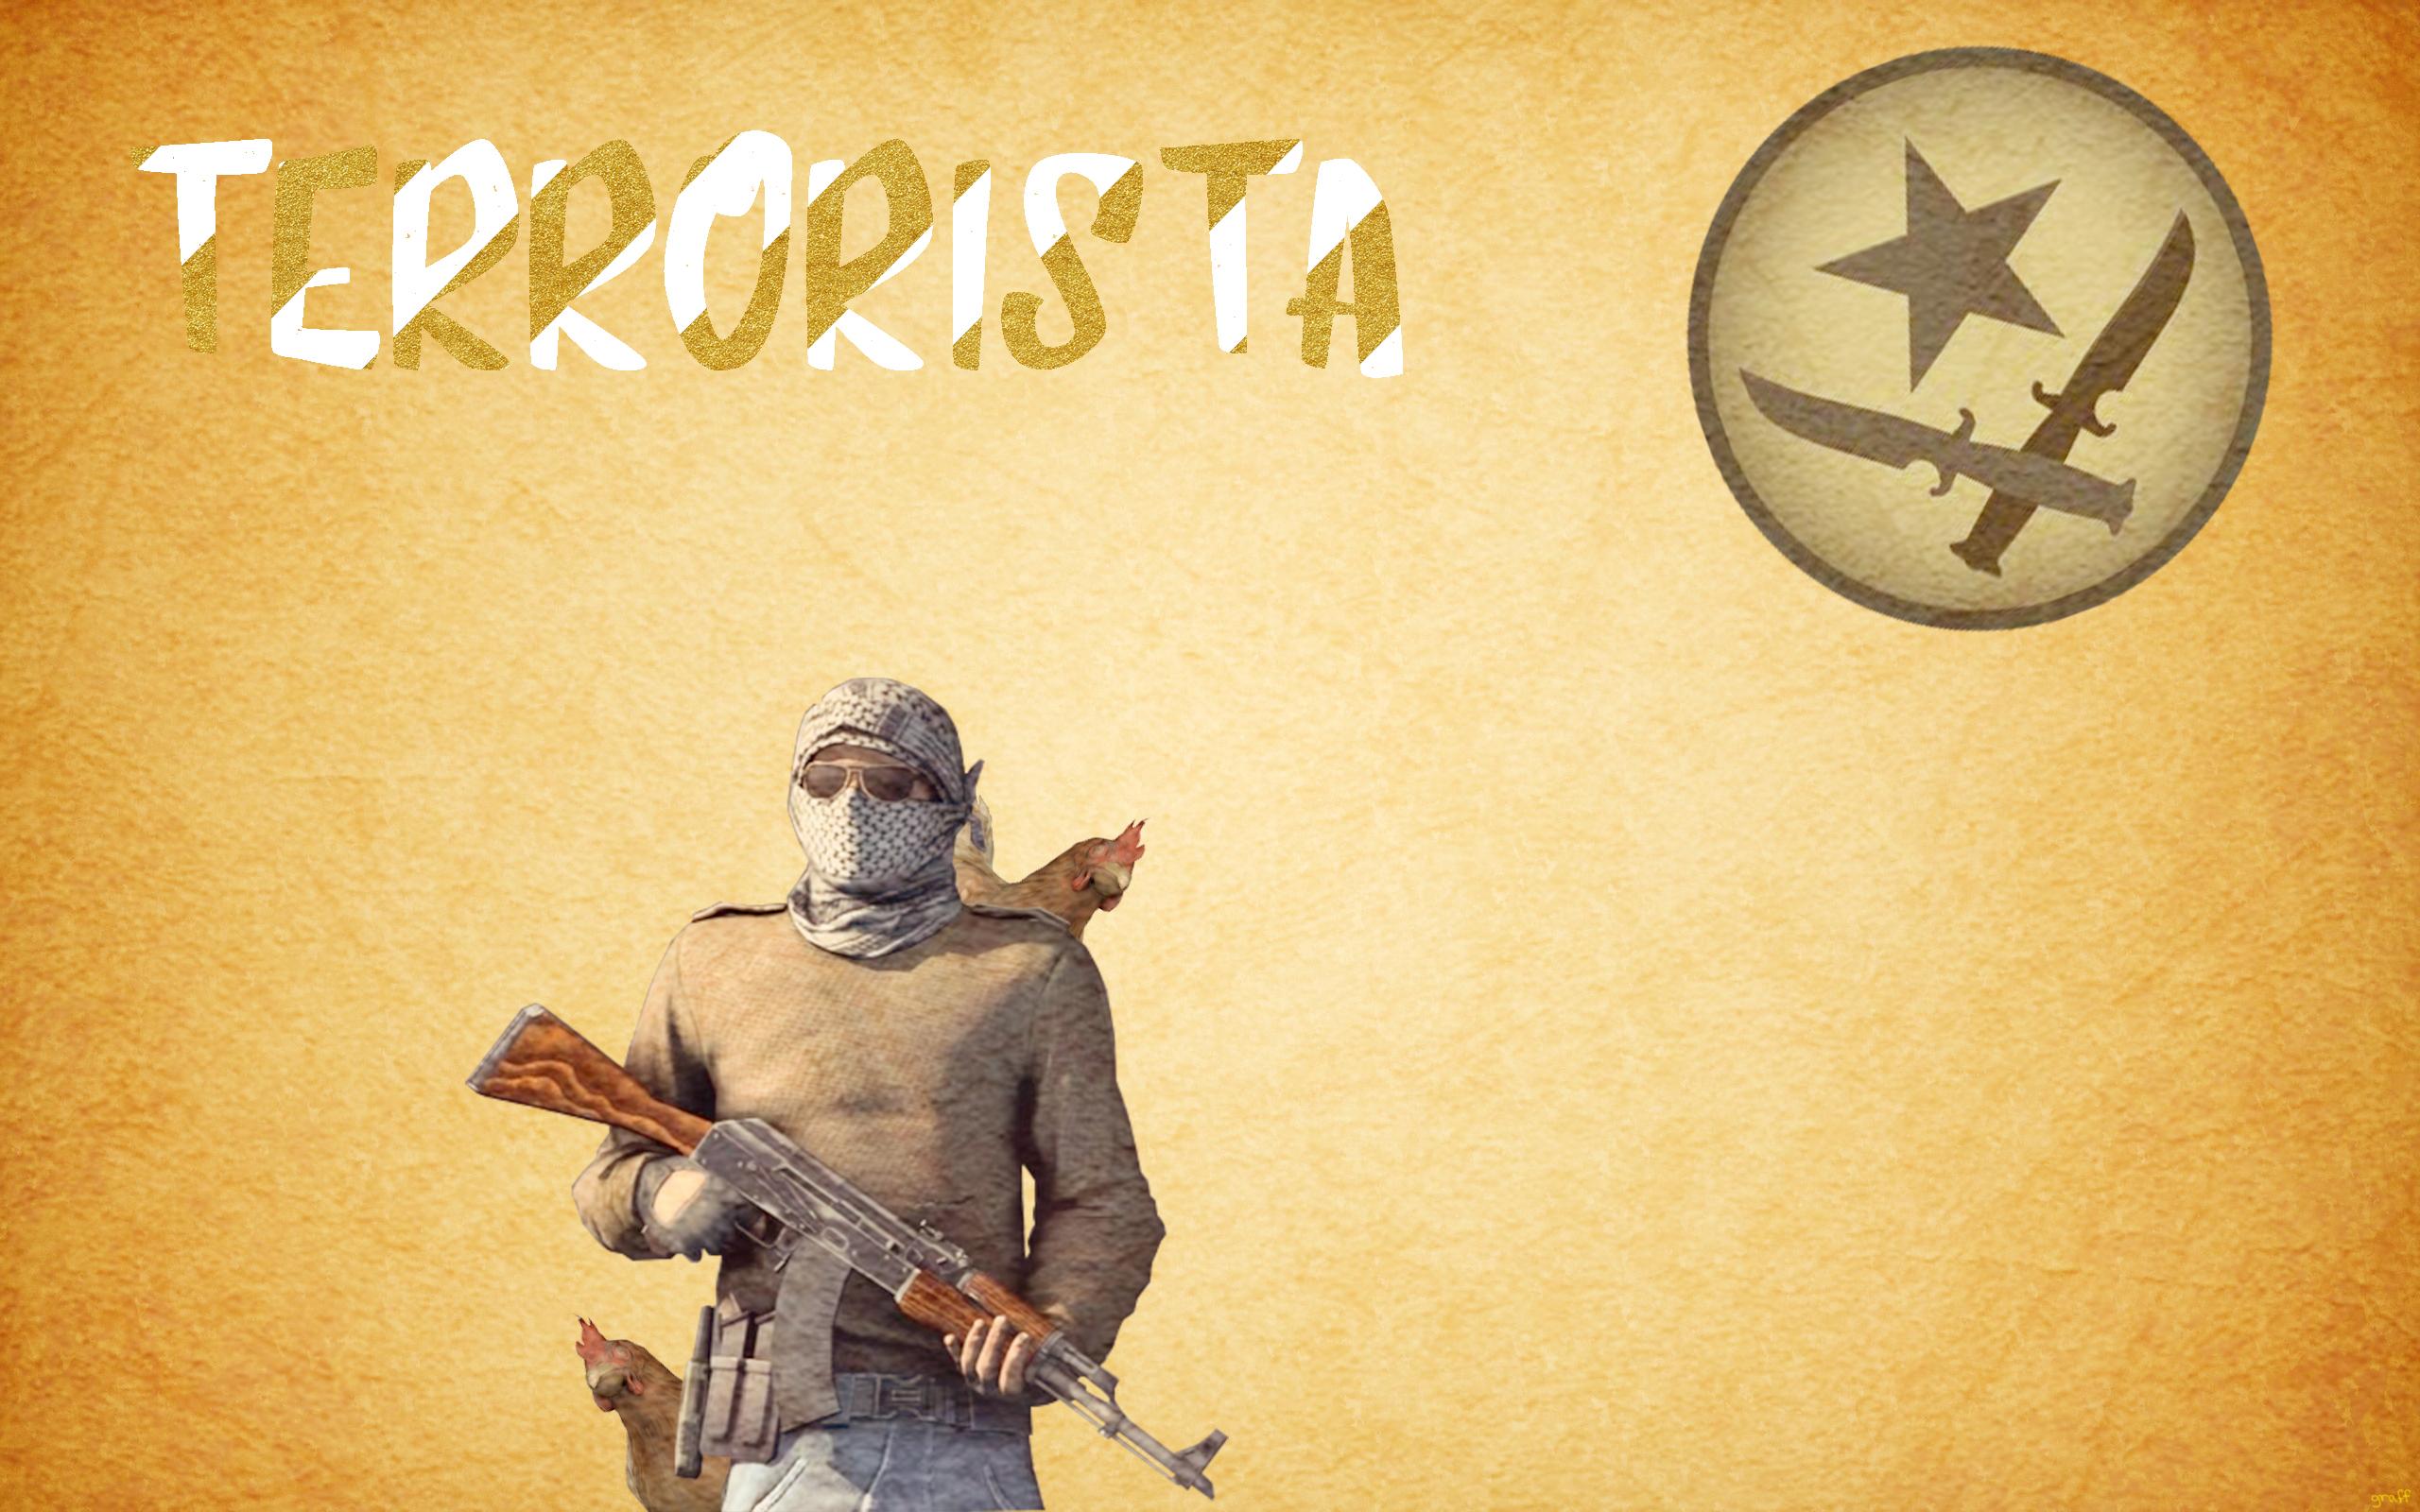 Counter-terrorista